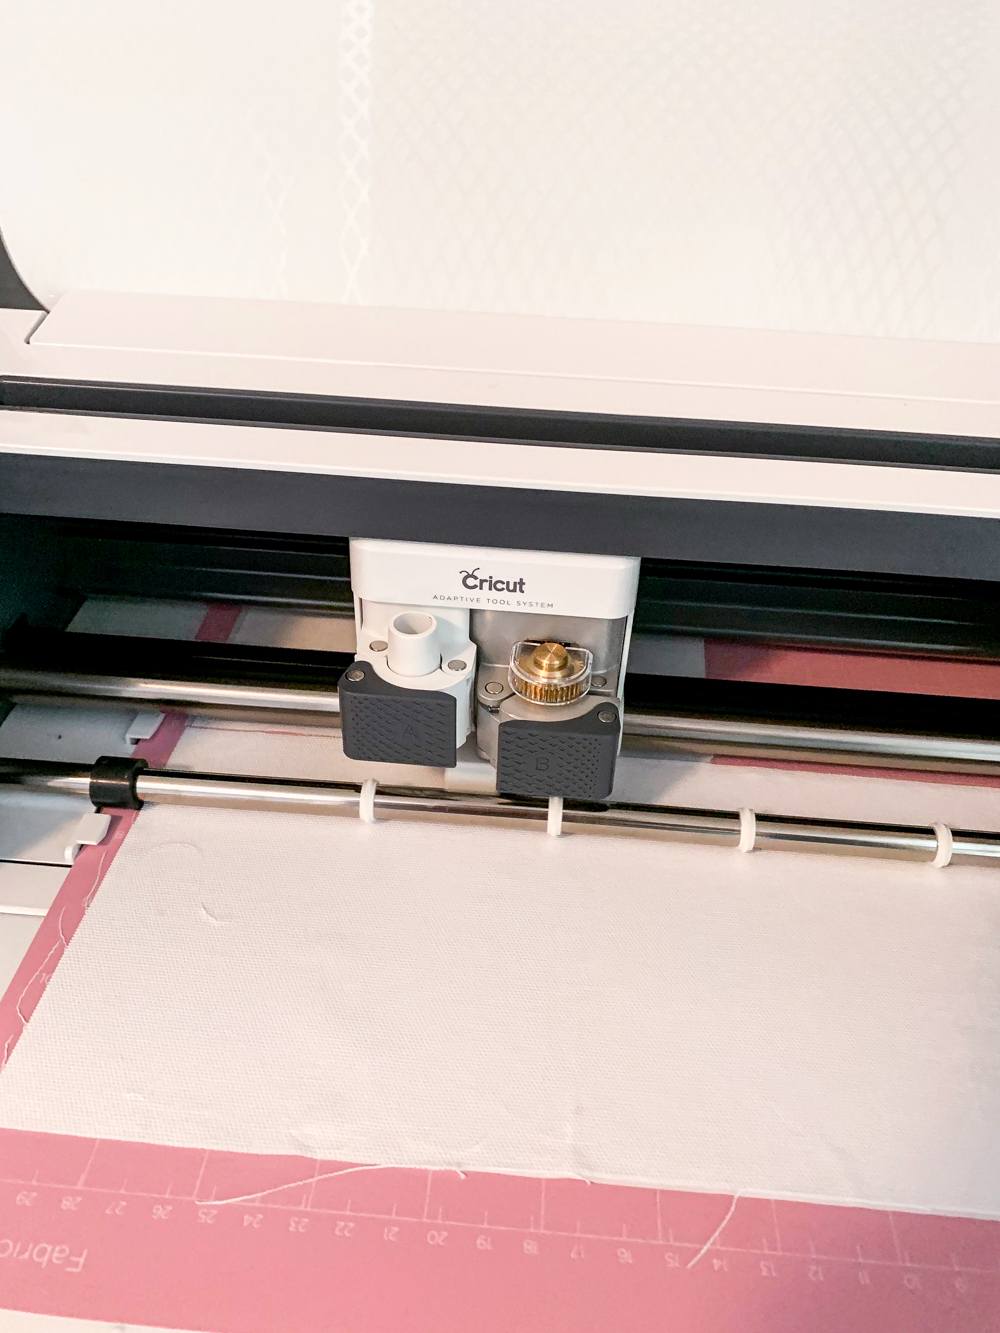 cutting fabric with Cricut machine